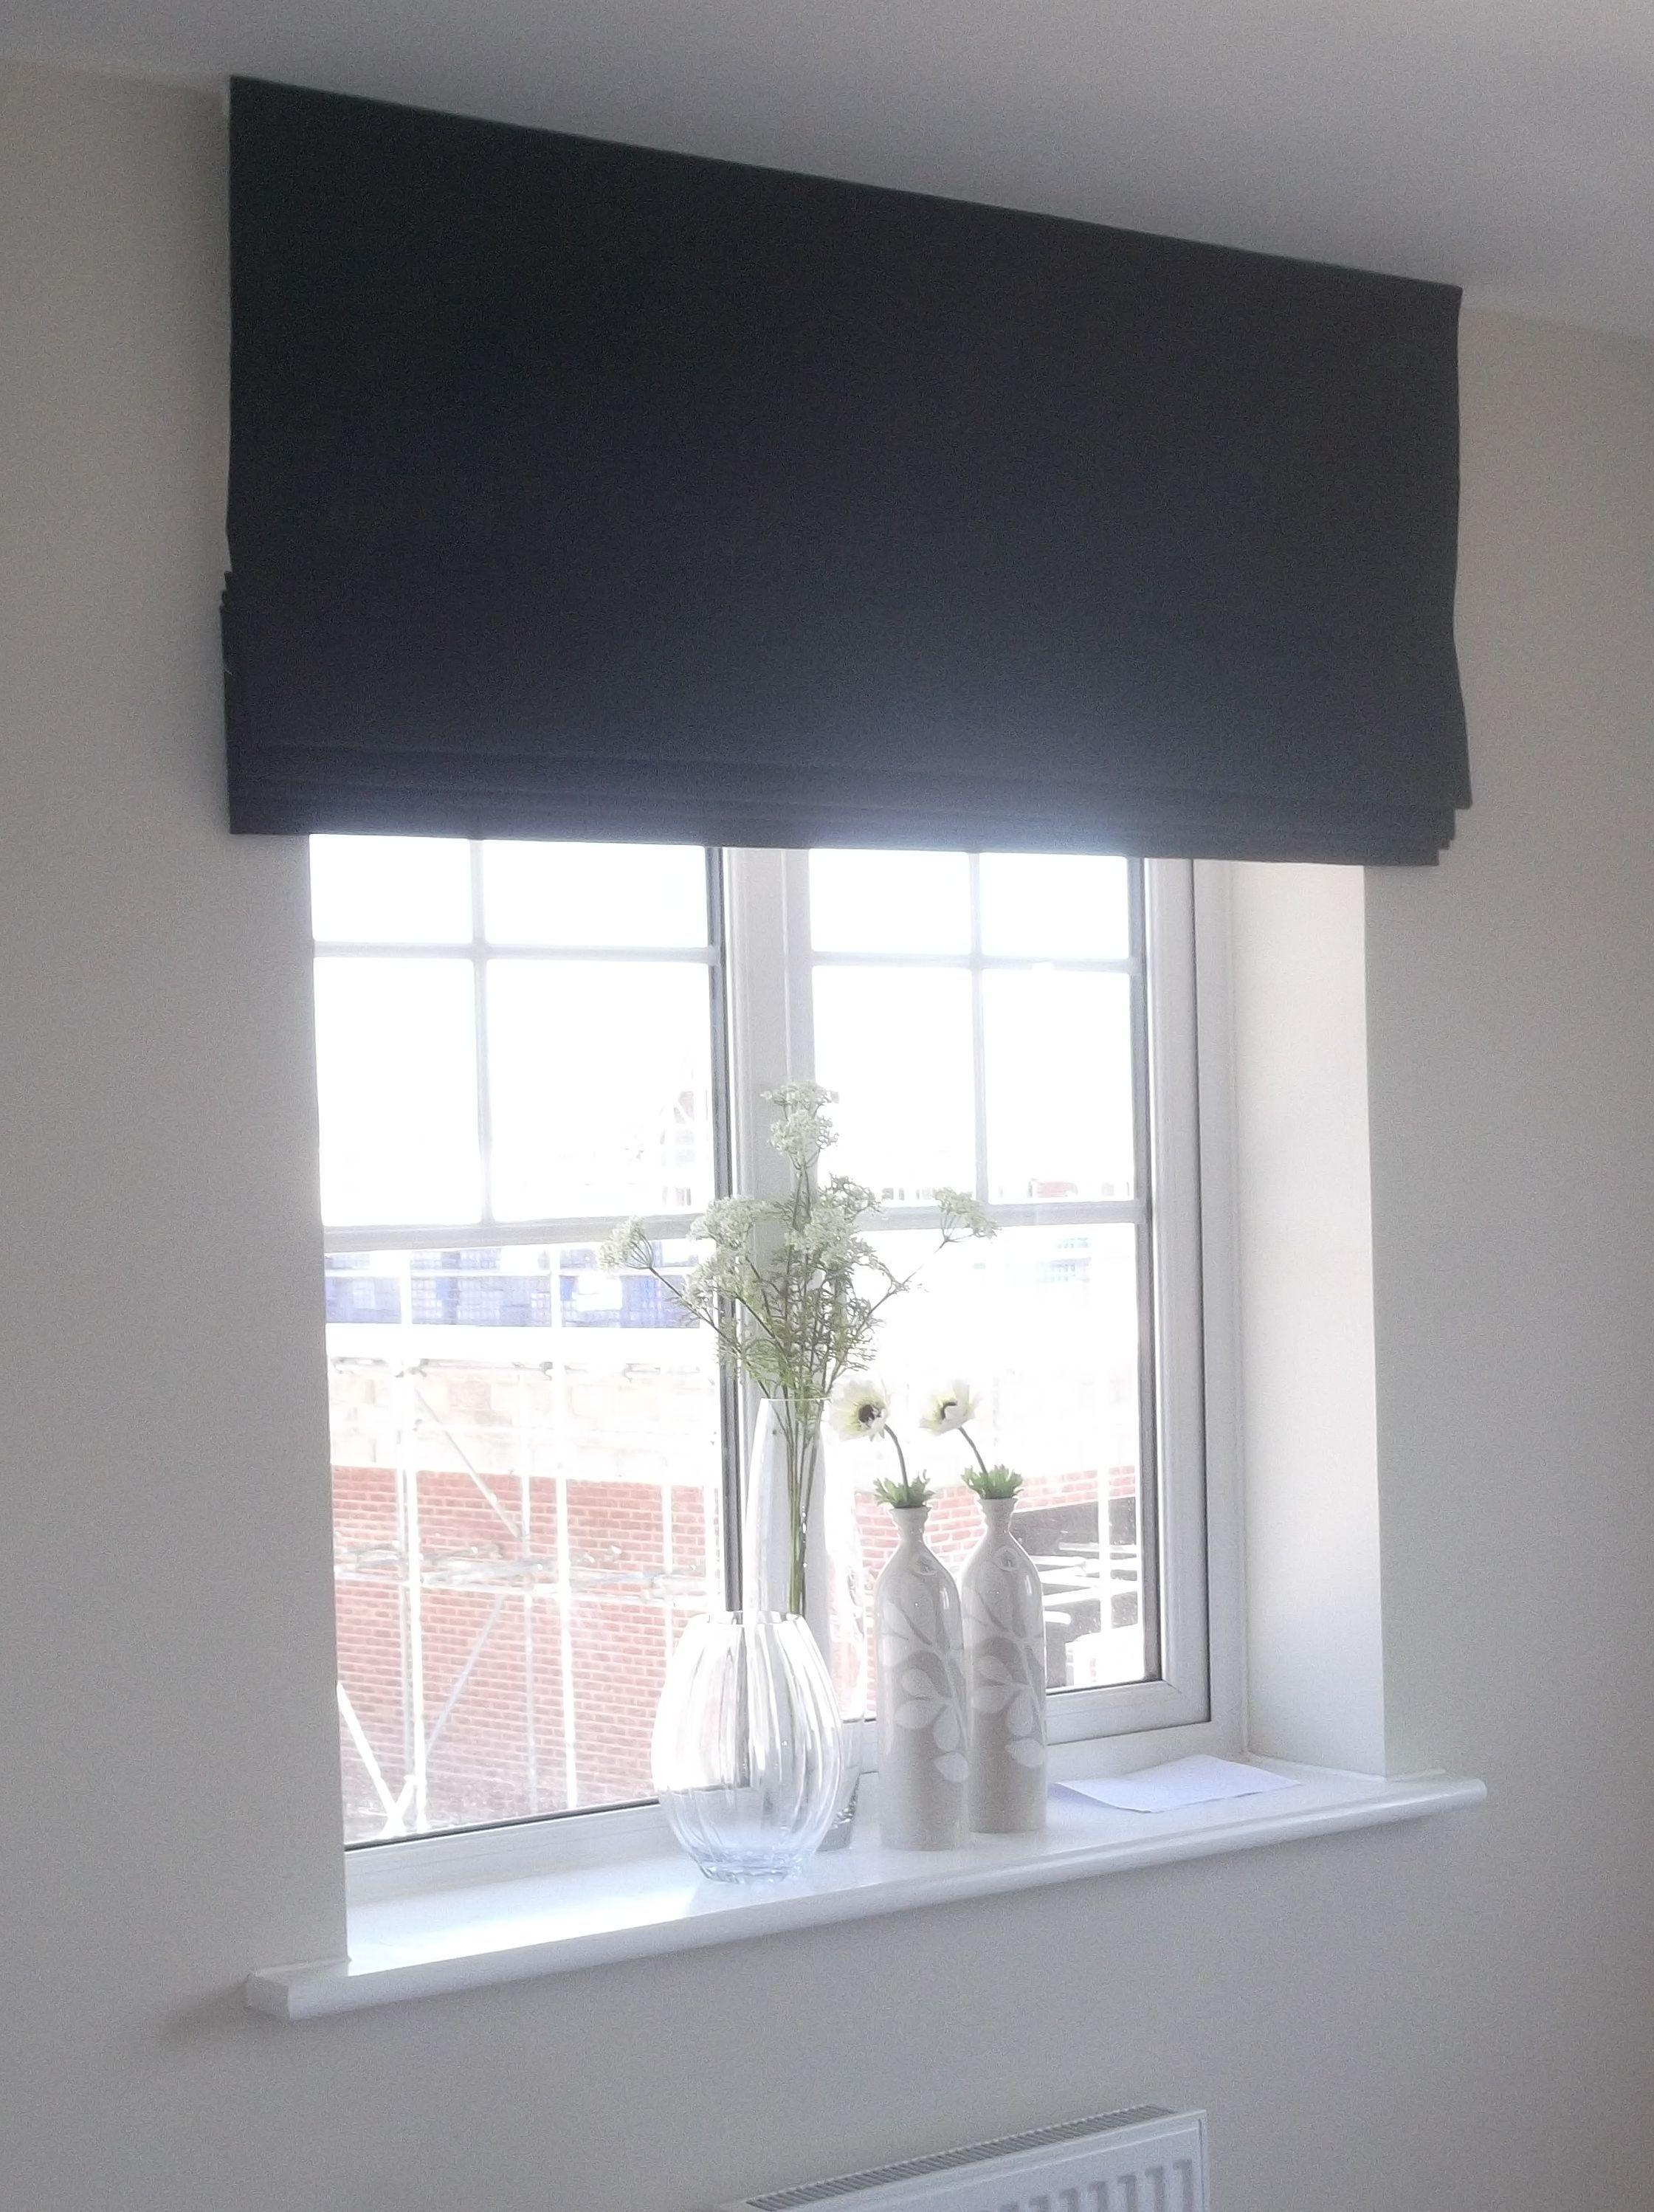 Kitchen window roman blinds  roman blind blindsandcurtainshardware bambooblindsandcurtains